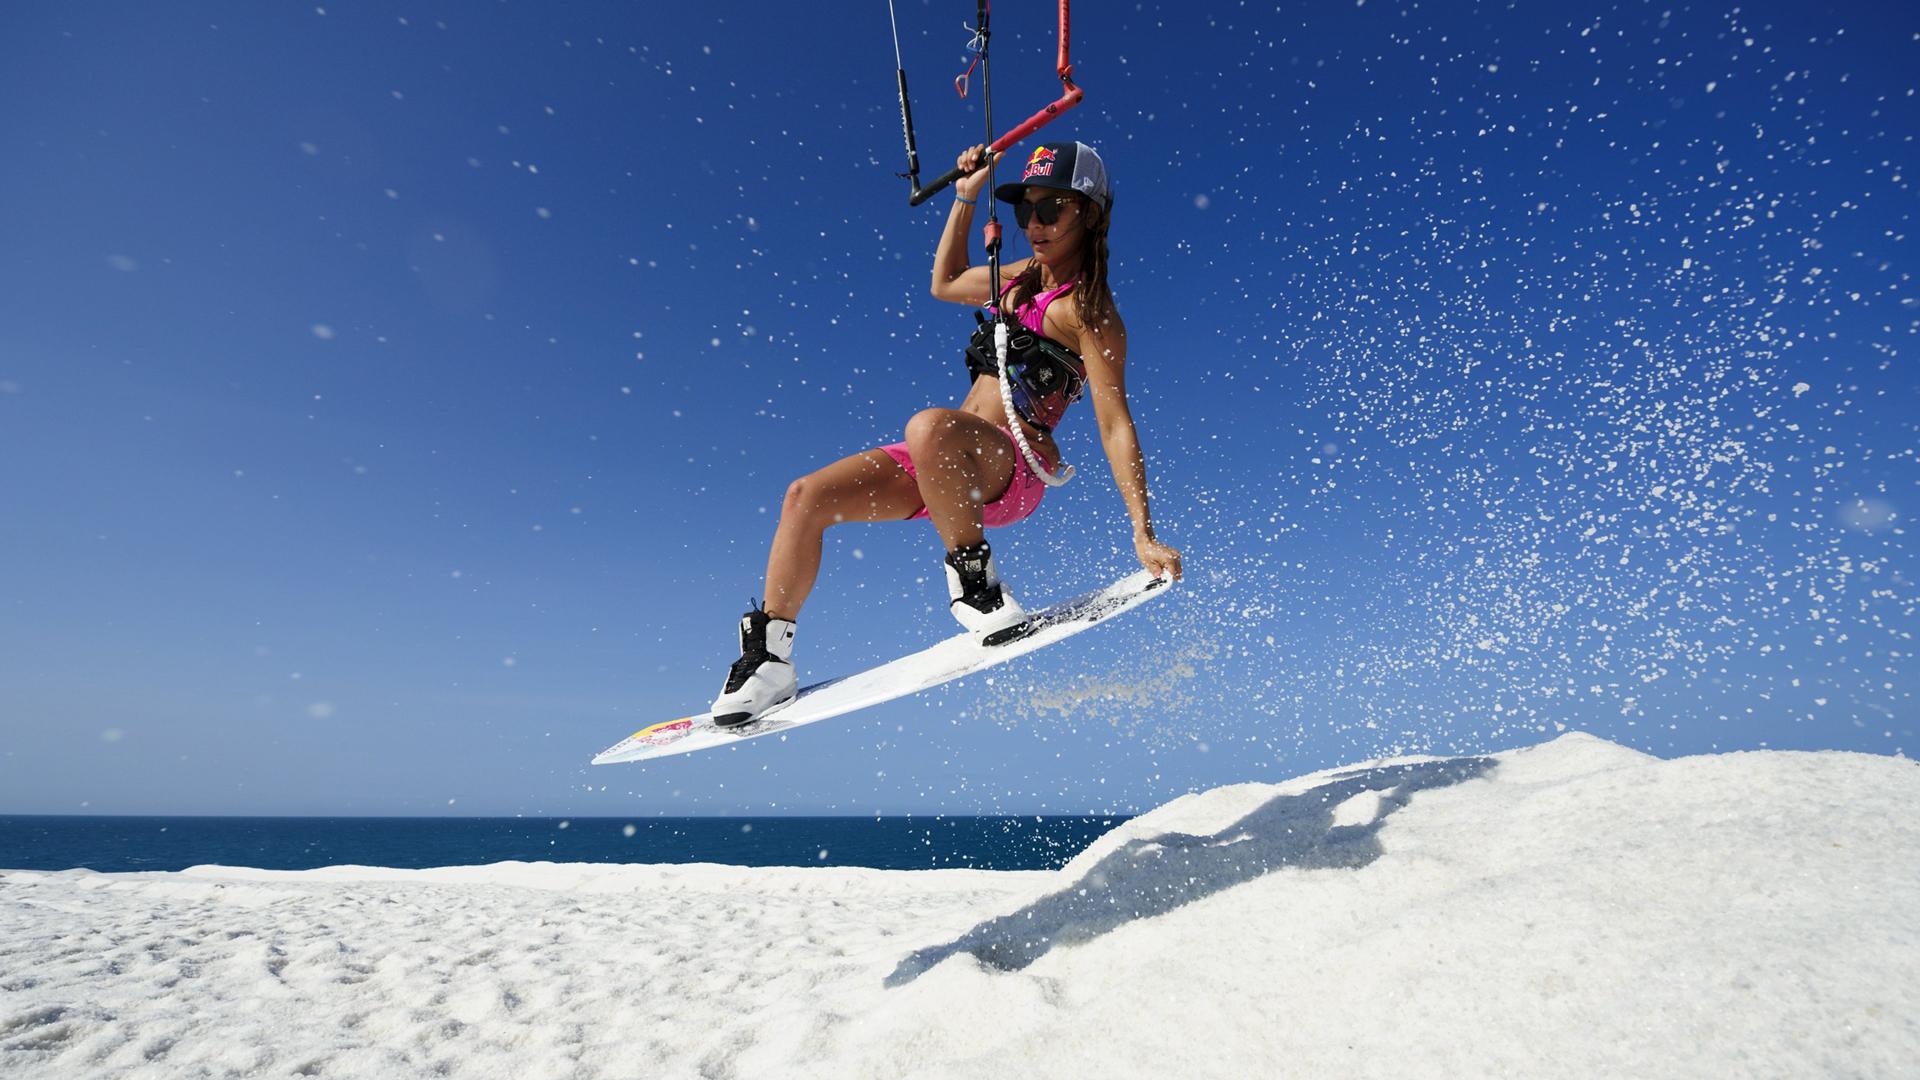 kitesurf wallpaper image - Bruna Kajiya jumping from salt mountain - in resolution: High Definition - HD 16:9 1920 X 1080